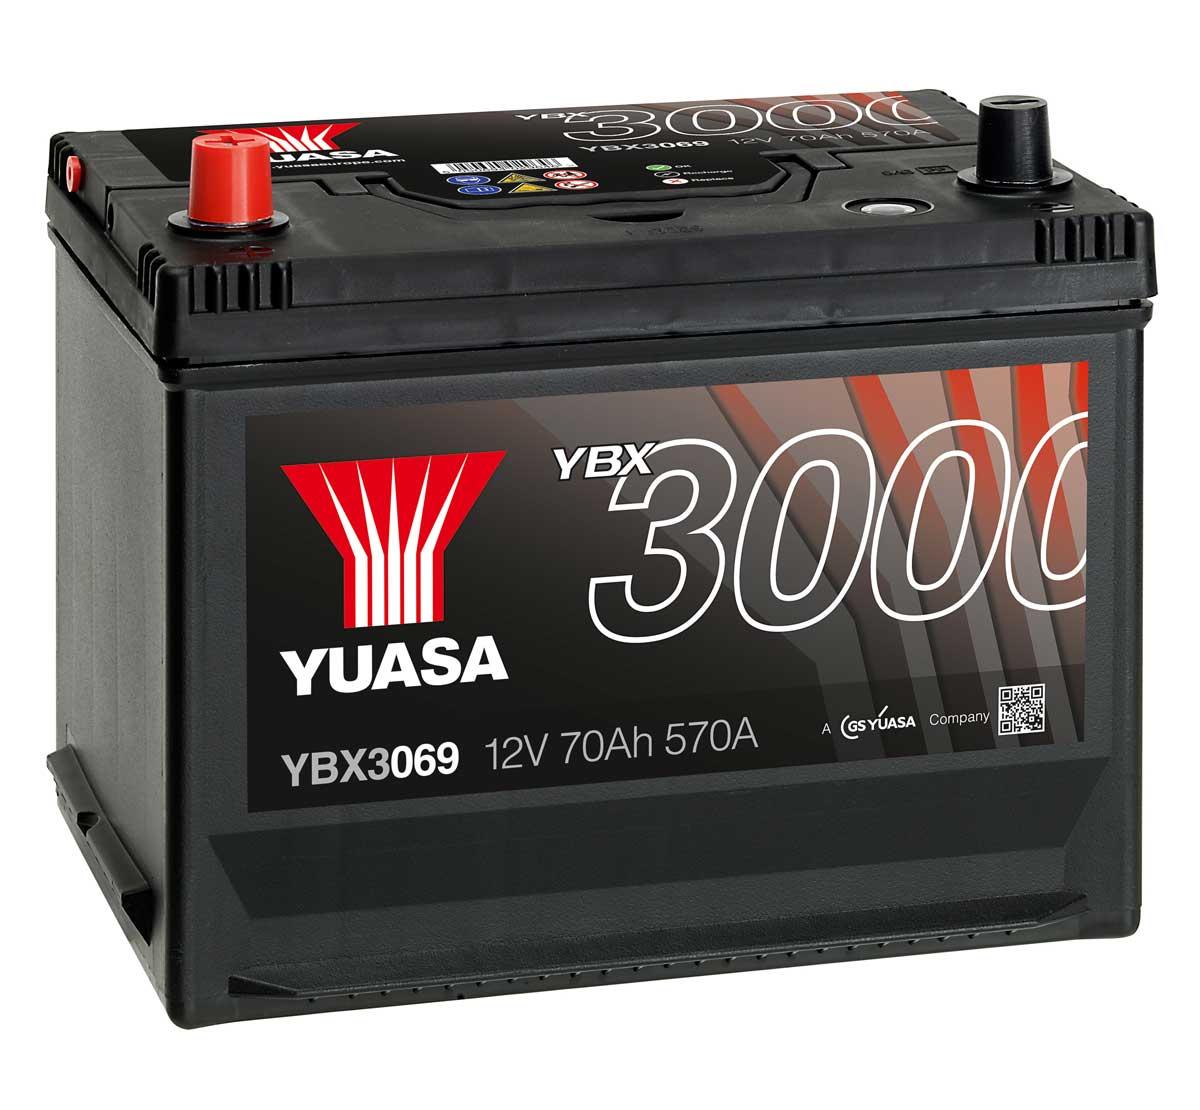 yuasa ybx3069 12v car battery mds battery. Black Bedroom Furniture Sets. Home Design Ideas